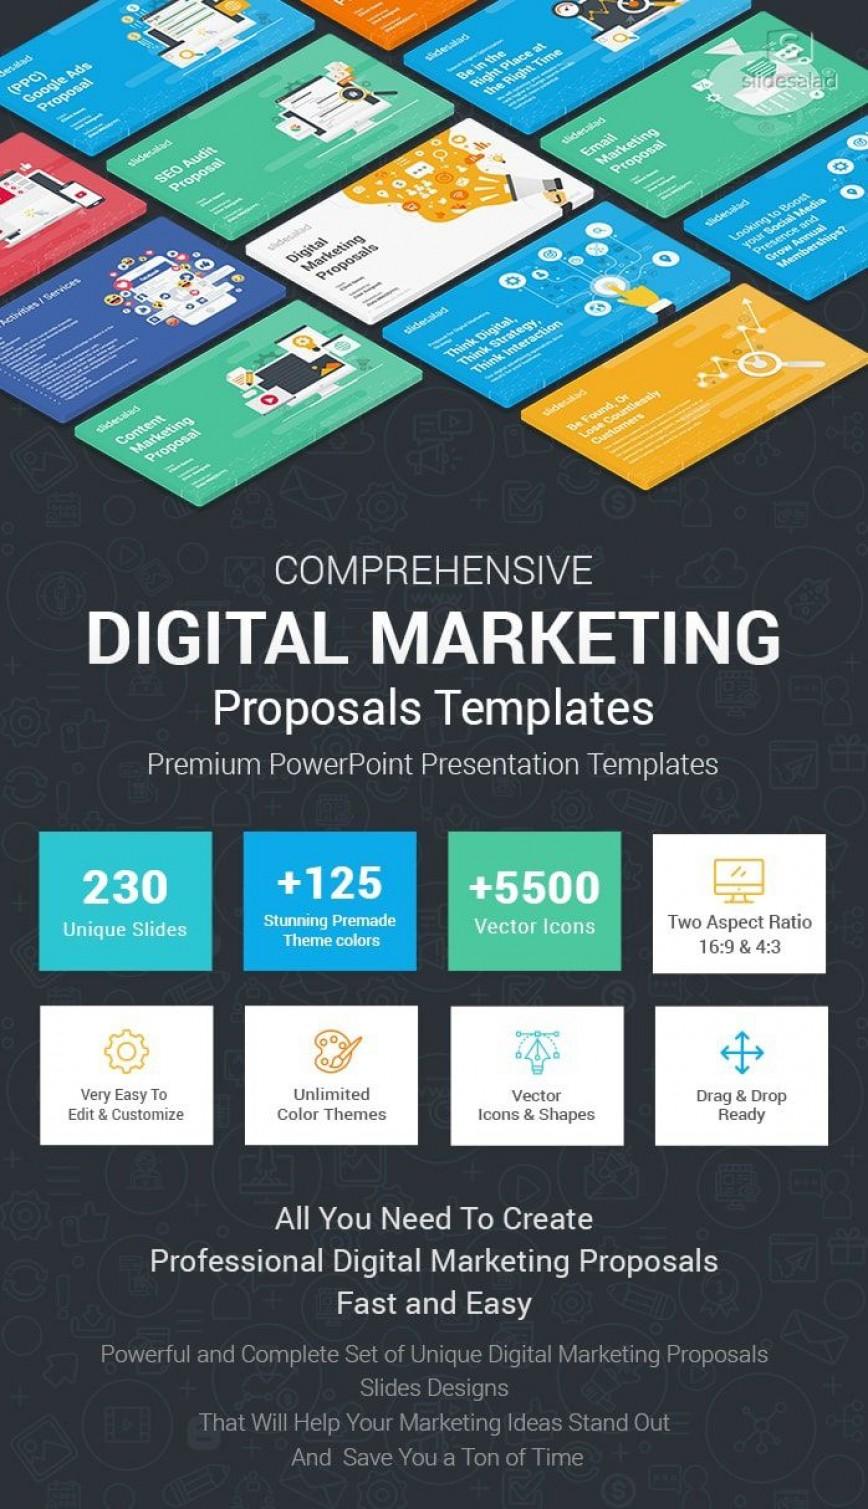 006 Amazing Digital Marketing Plan Sample Ppt Design